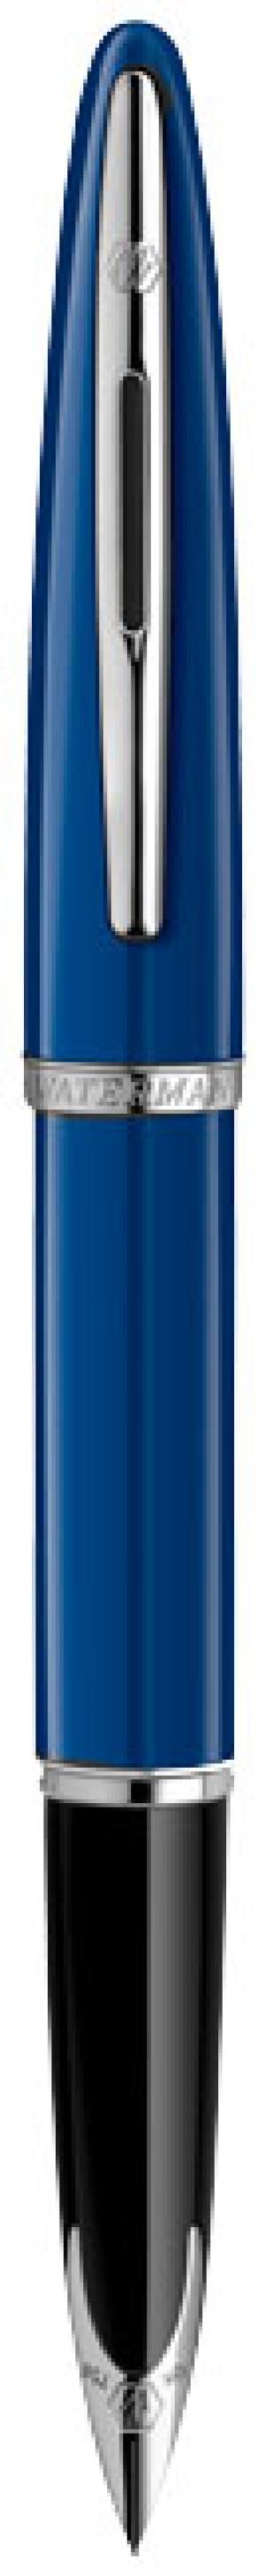 obrazok Plniace pero Carène - Reklamnepredmety